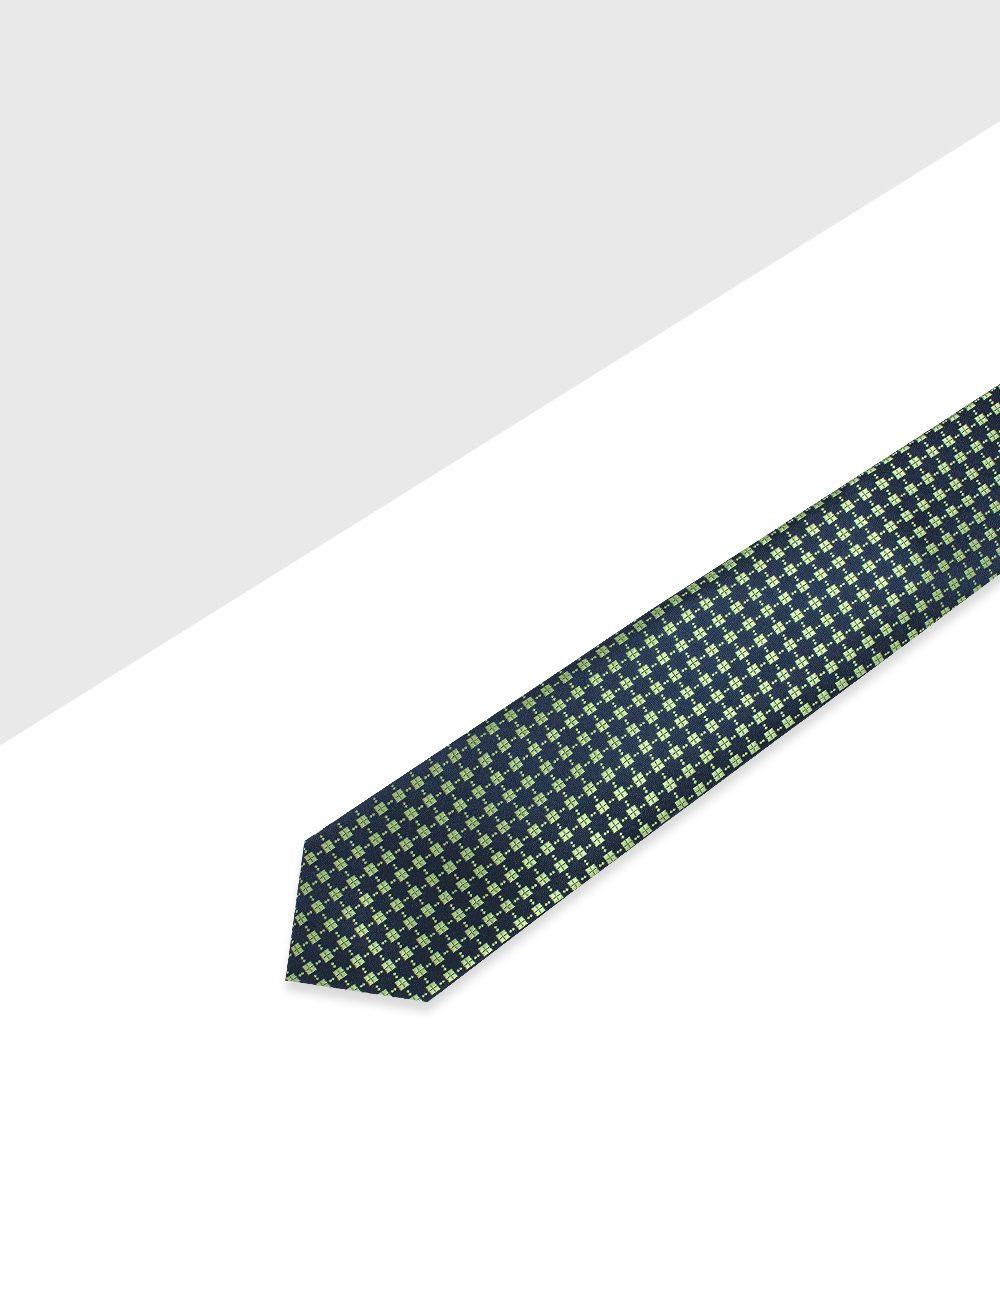 Navy and Green Diamond Pattern Woven Necktie - NT40.4